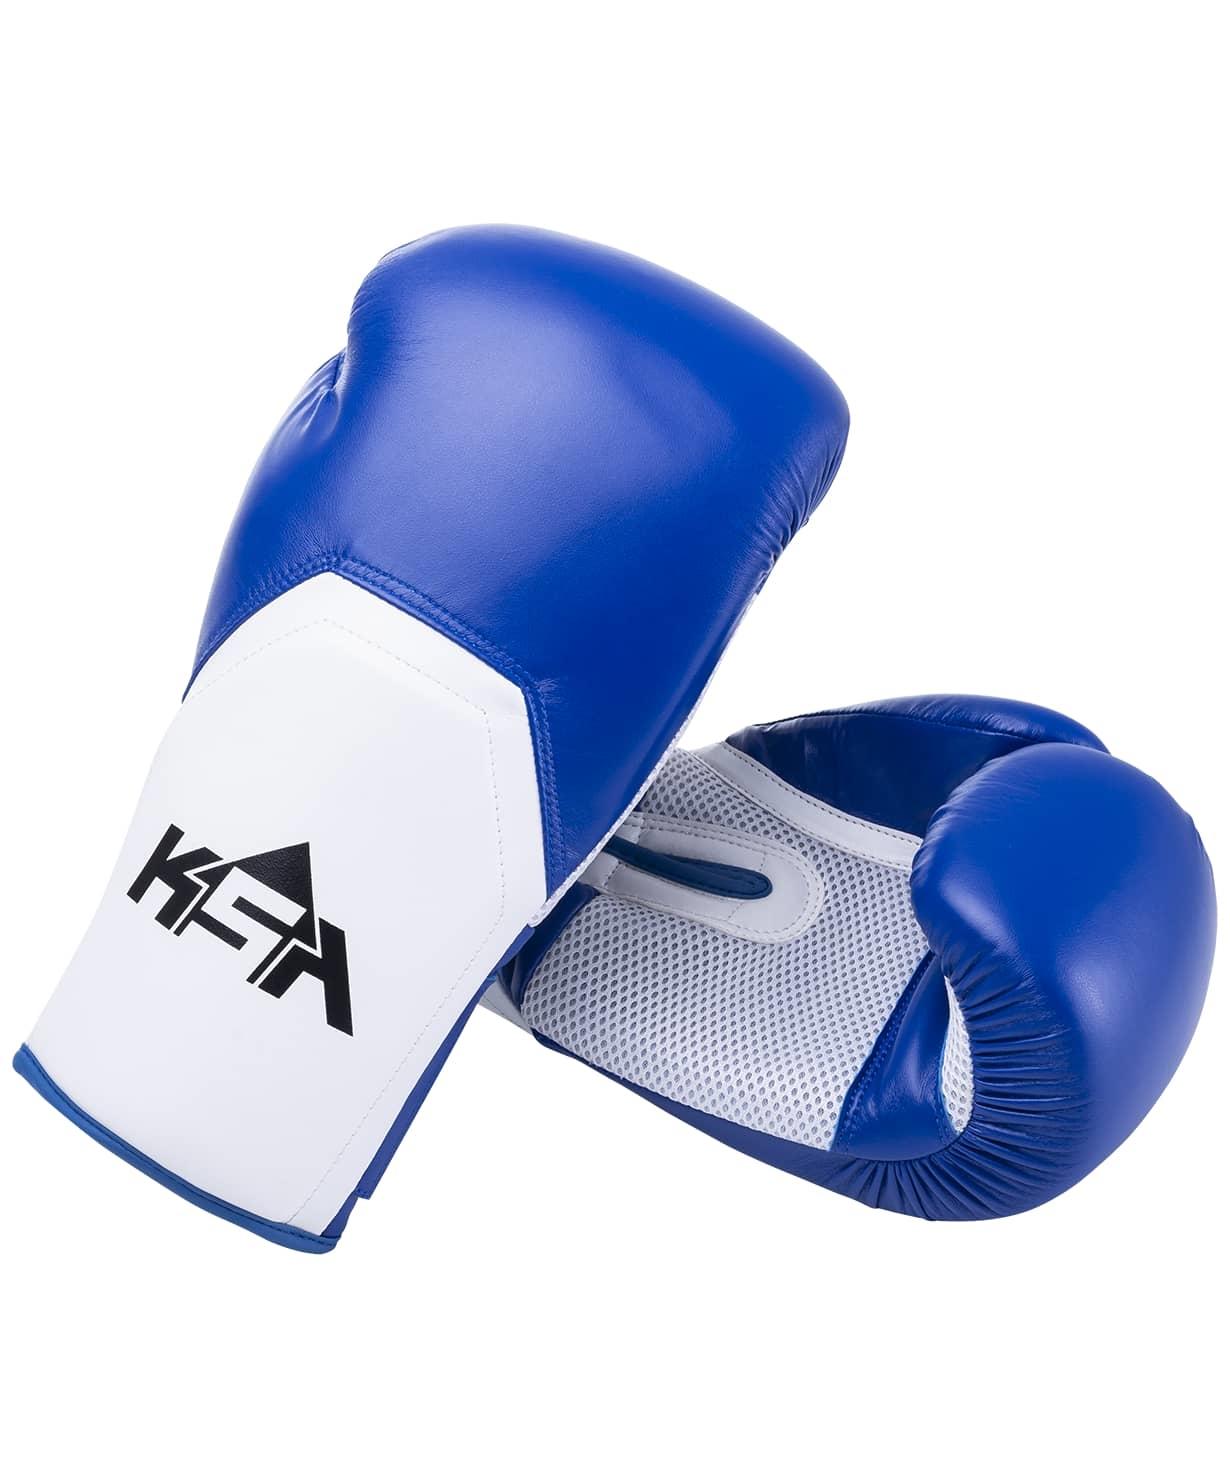 Перчатки боксерские Scorpio Blue, к/з, 12 oz